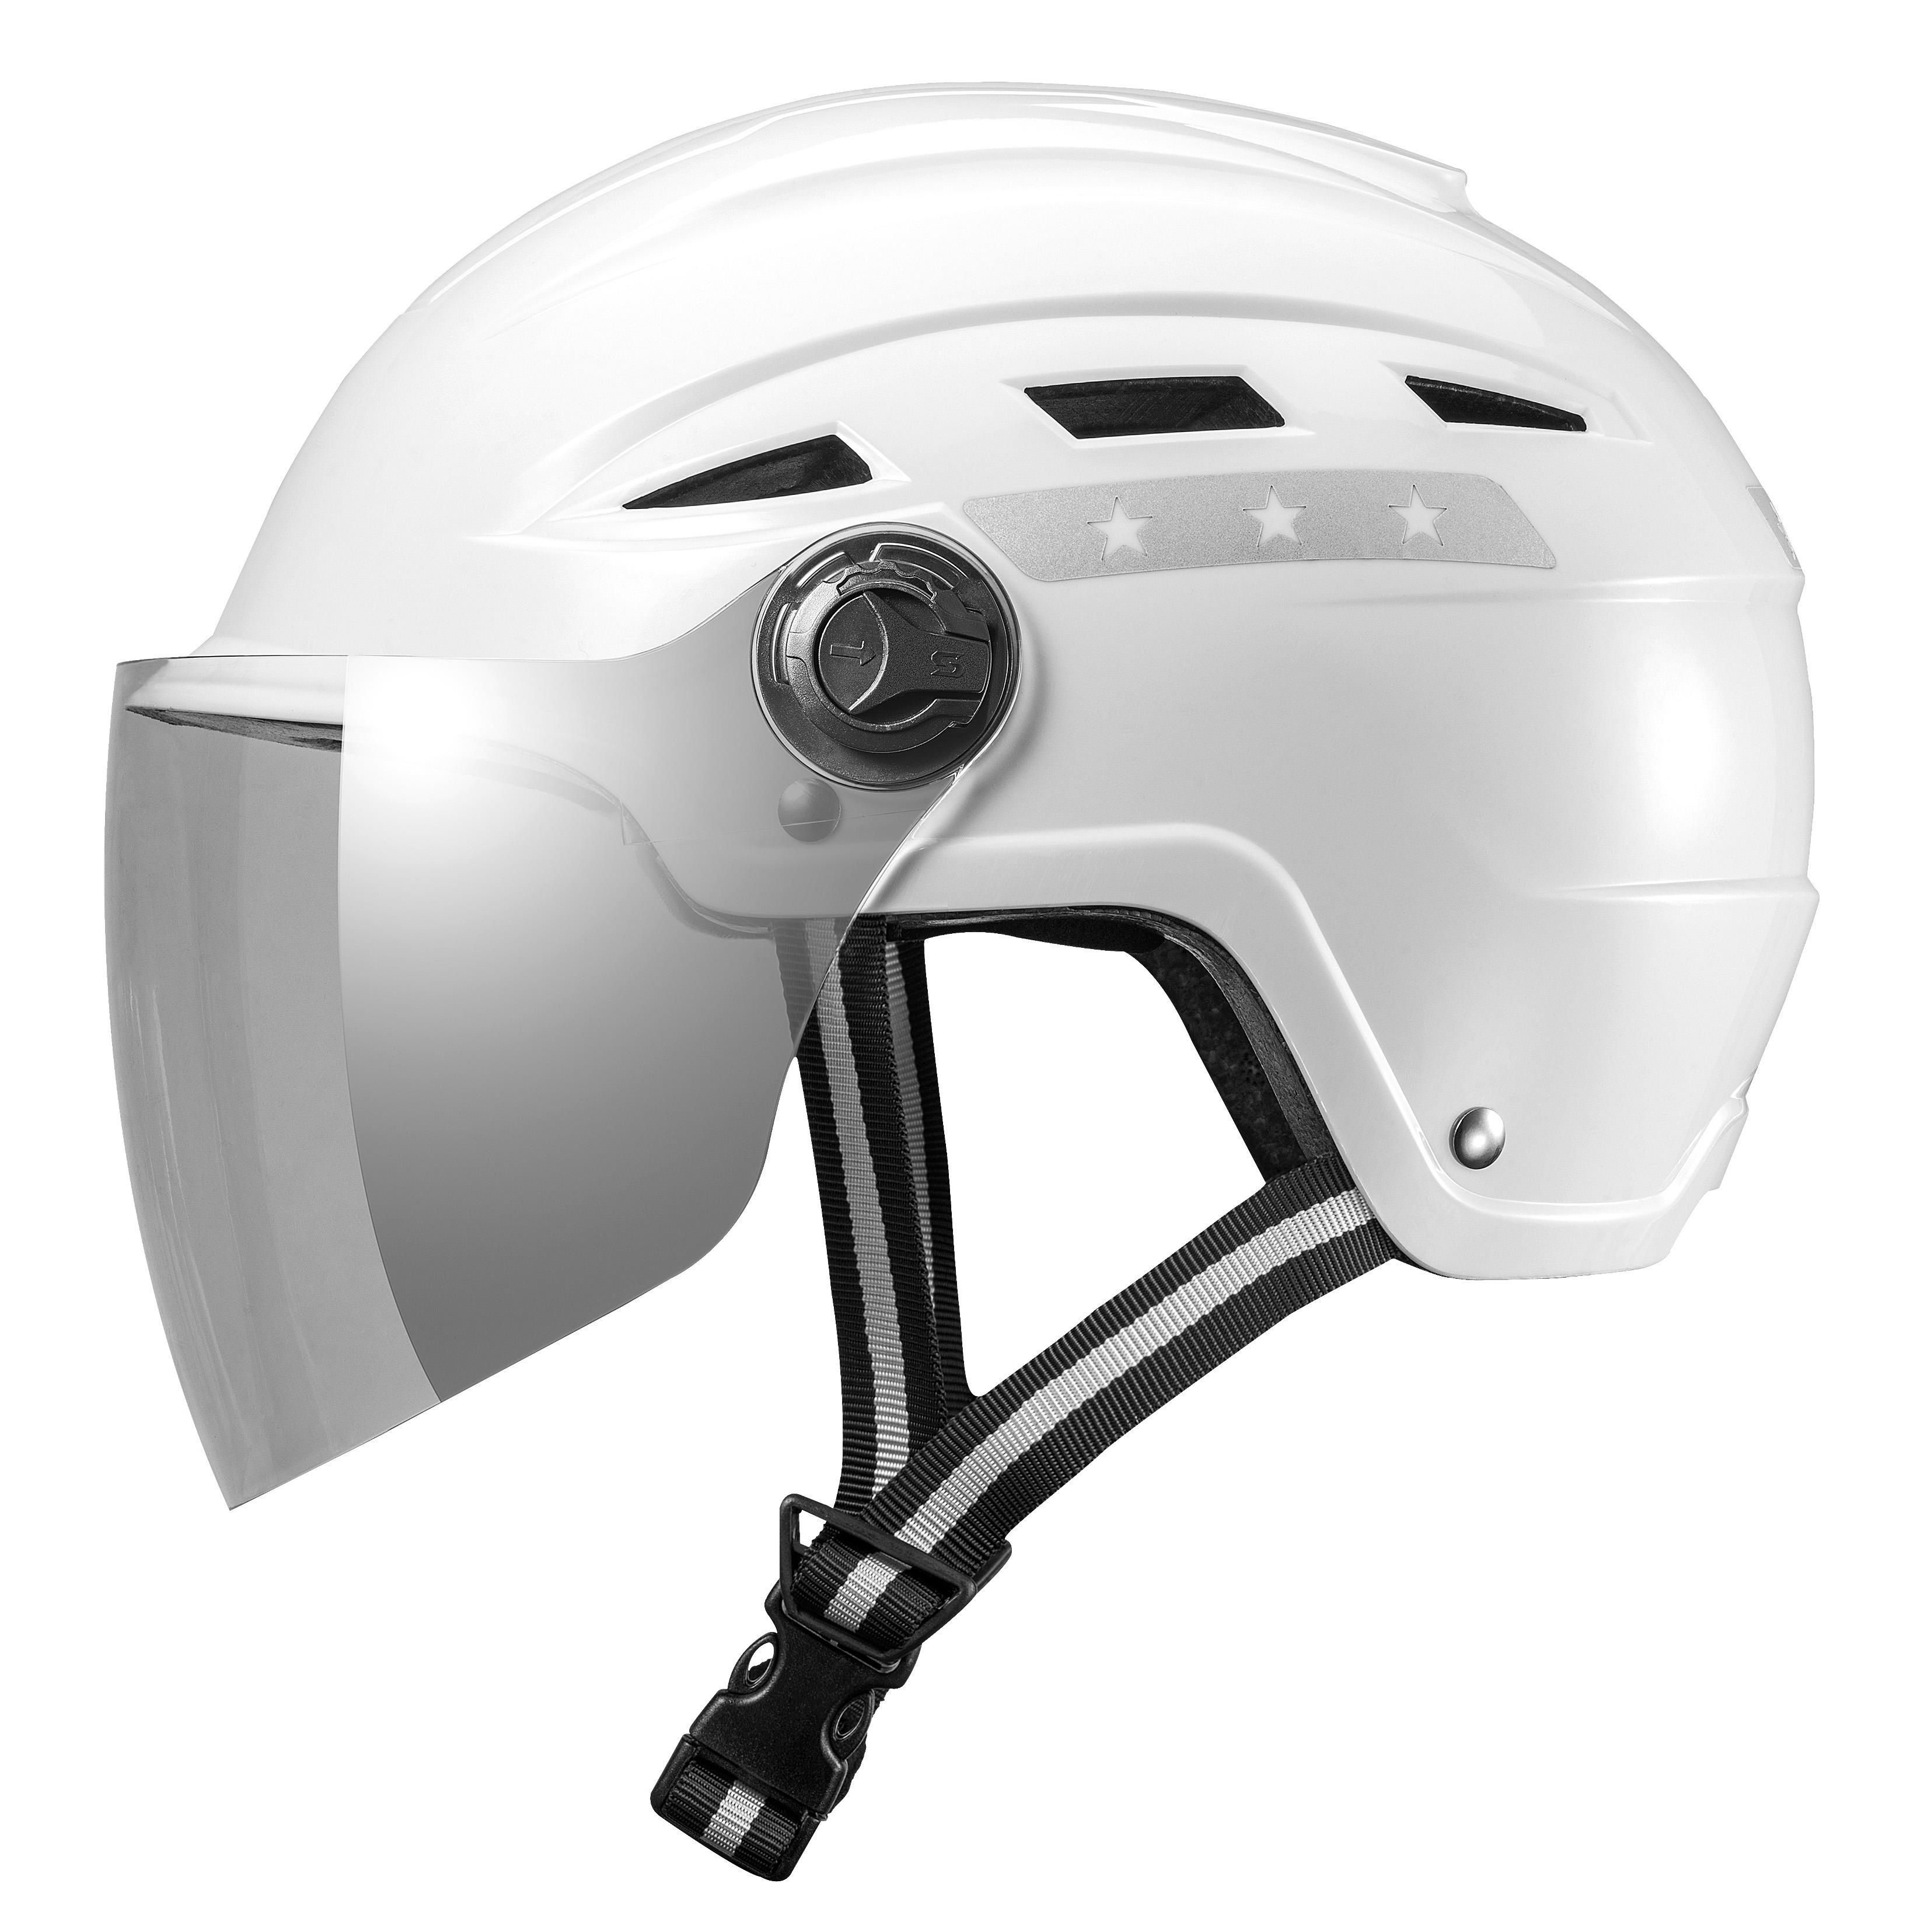 E1-8G E-Bike Helmet with goggles